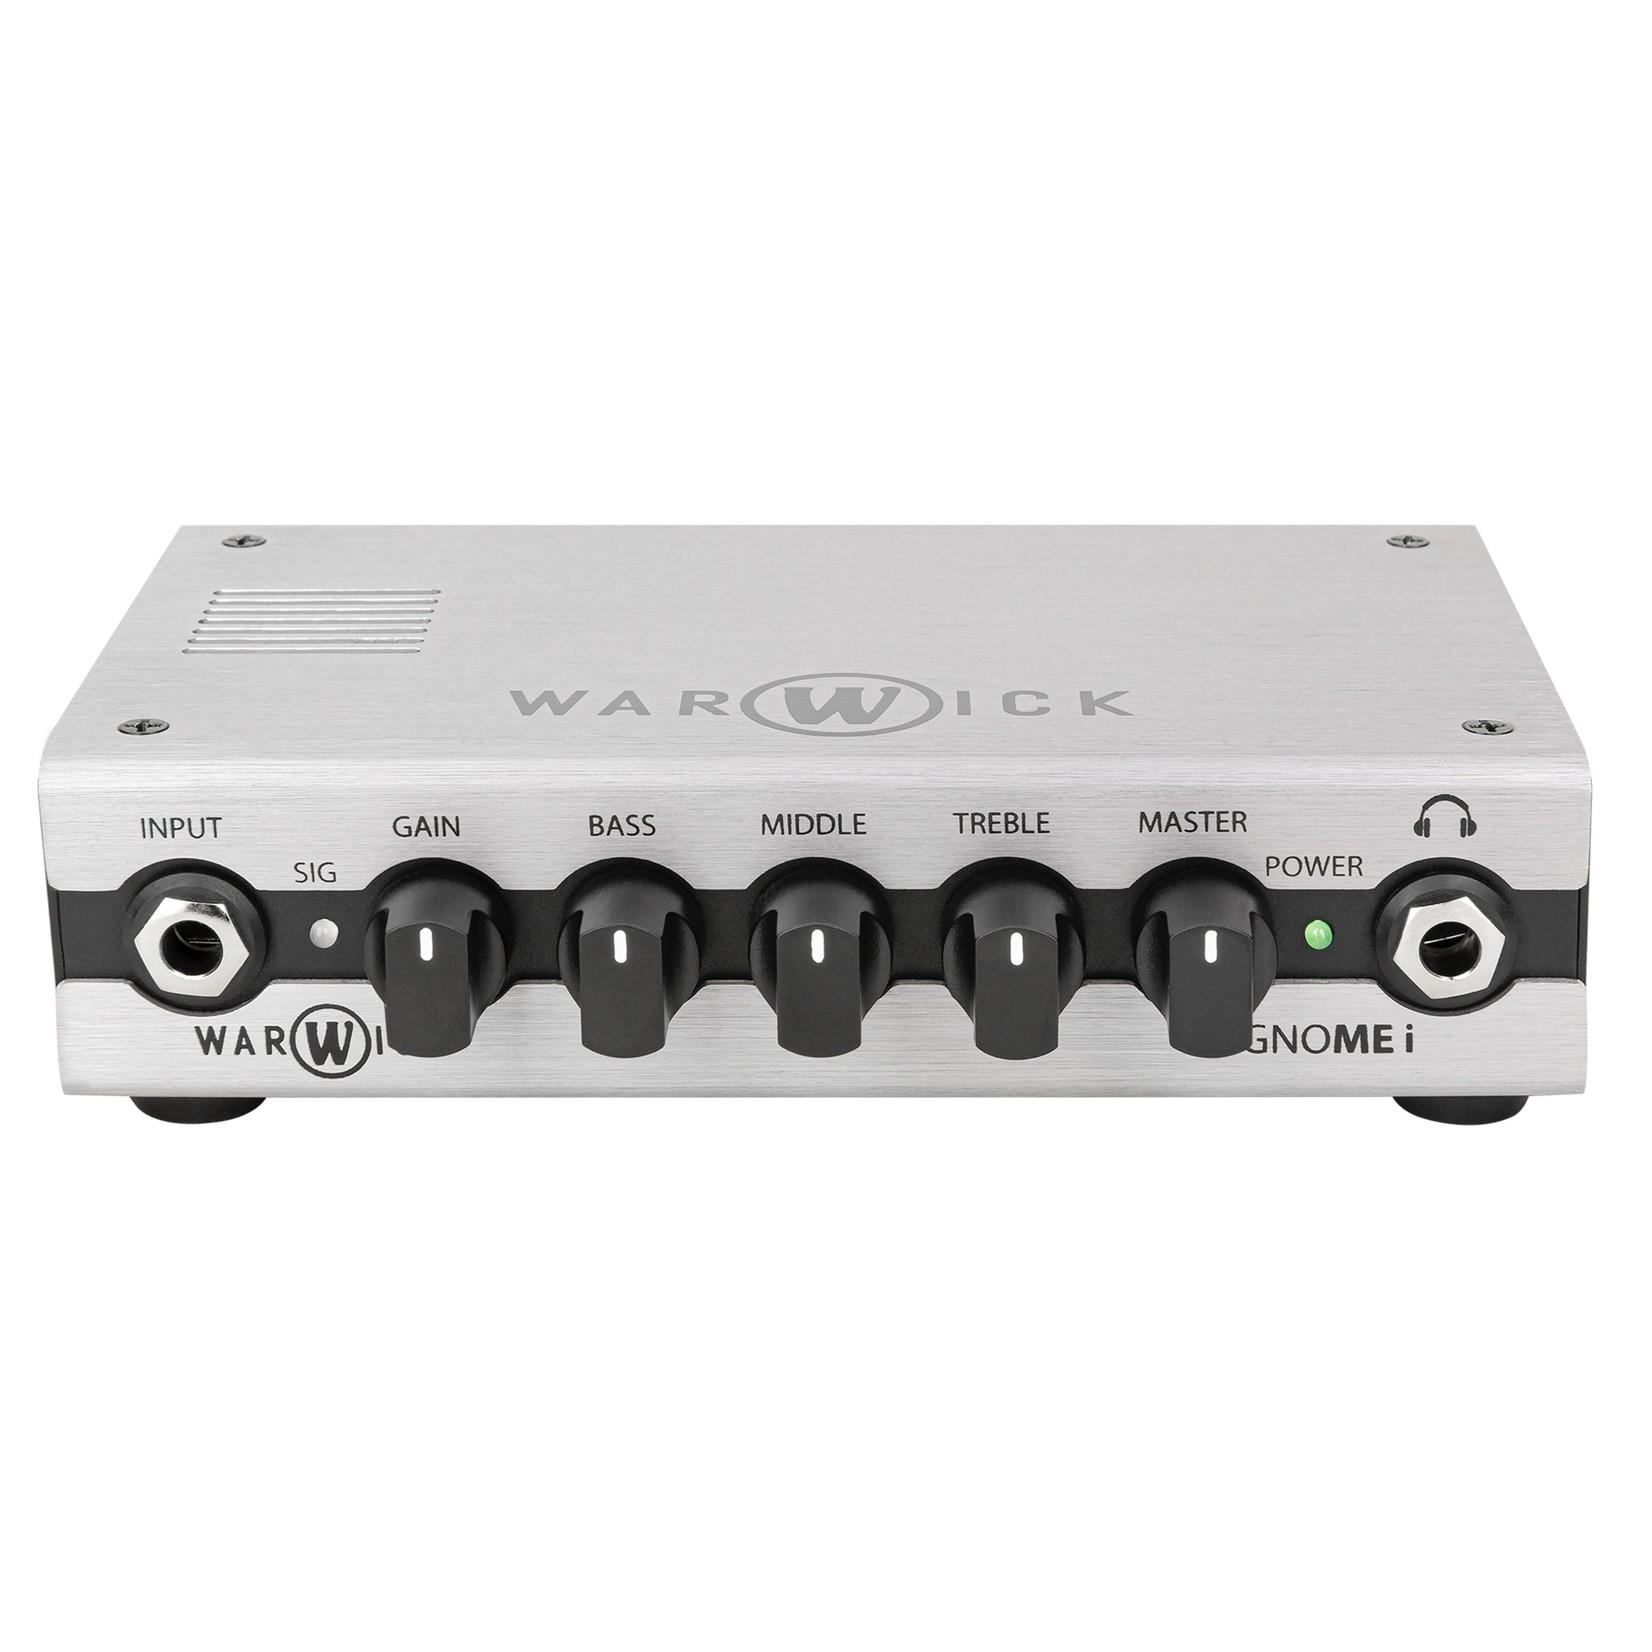 Warwick Warwick Gnome i - Pocket Bass Amp Head with USB Interface, 200 Watt